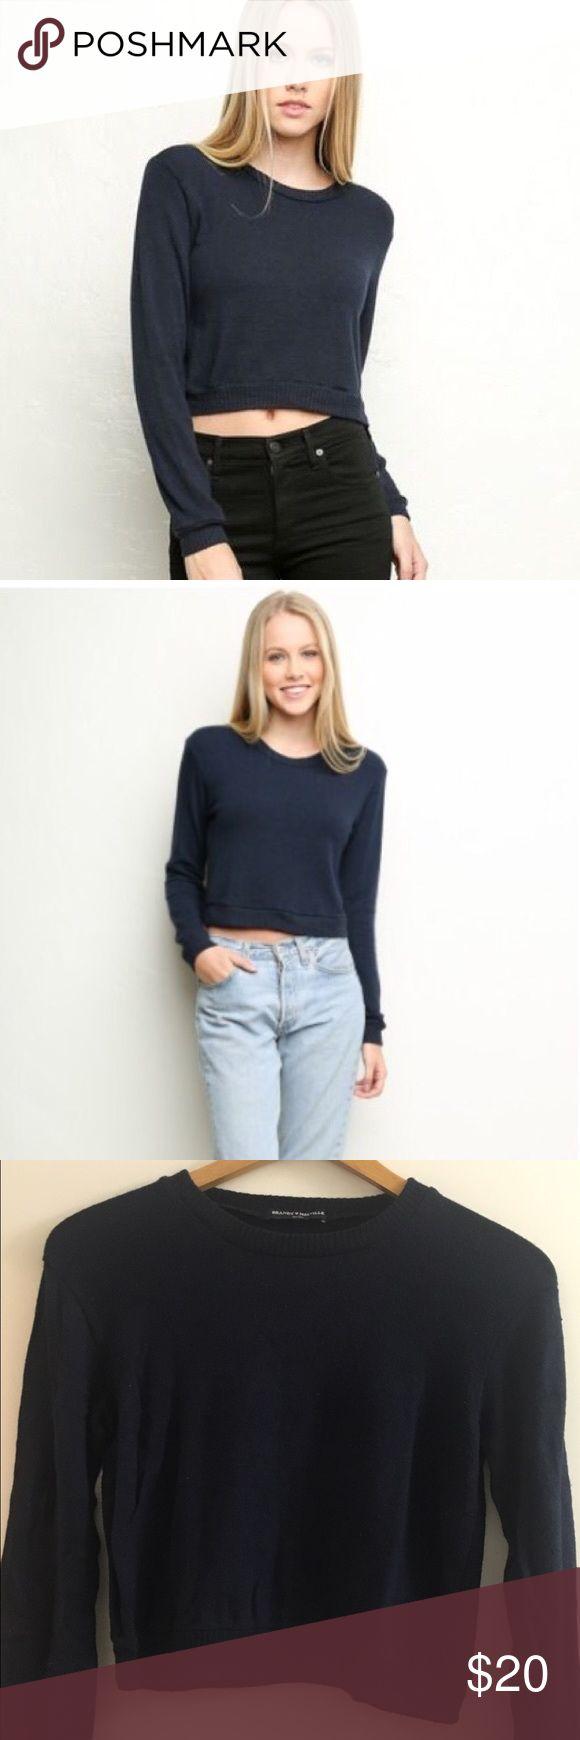 Brandy Melville Navy Blue Crop Top Sweater Brandy Melville Navy Blue Crop Top Sweater Size: One size (xs/small/medium) Color: Navy Blue Brandy Melville Sweaters